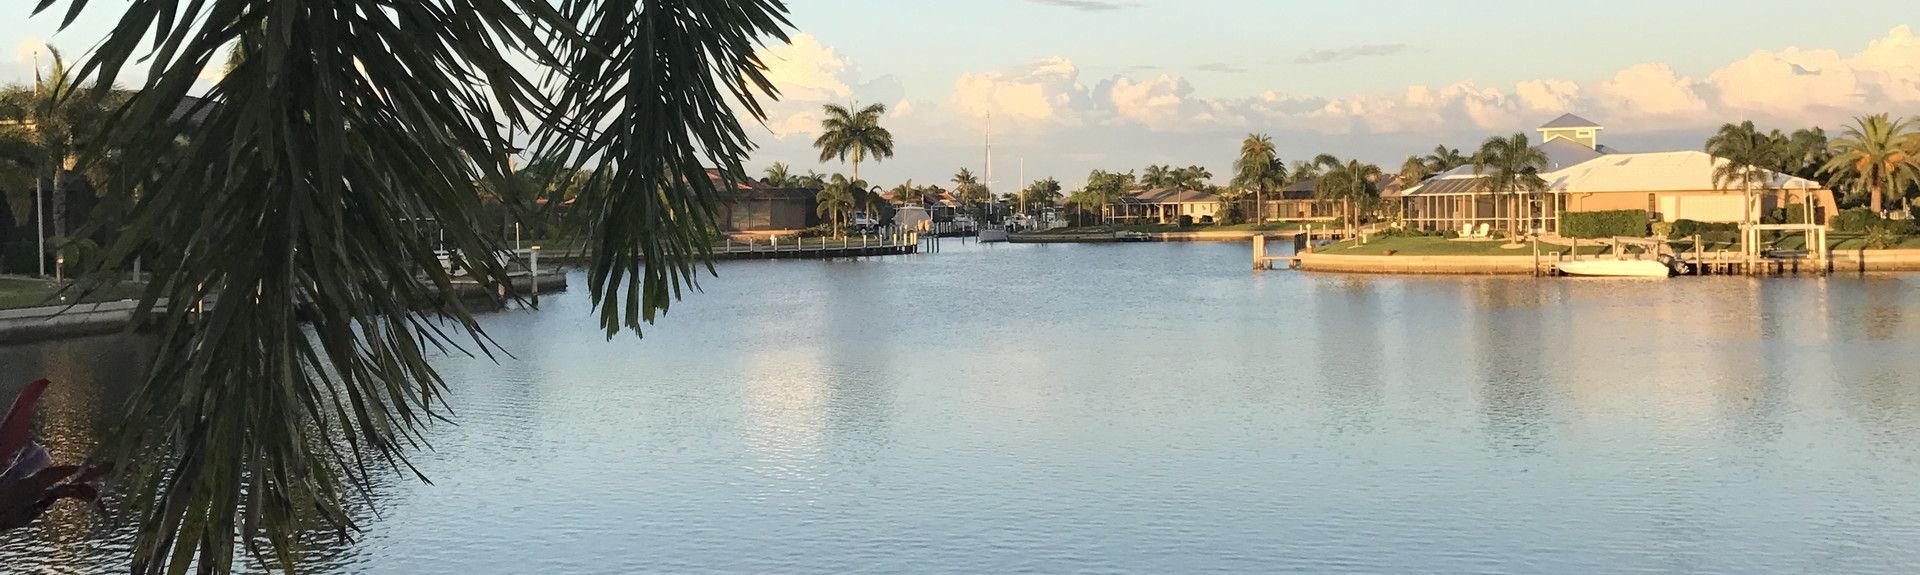 Punta Gorda Isles, Punta Gorda, FL, USA